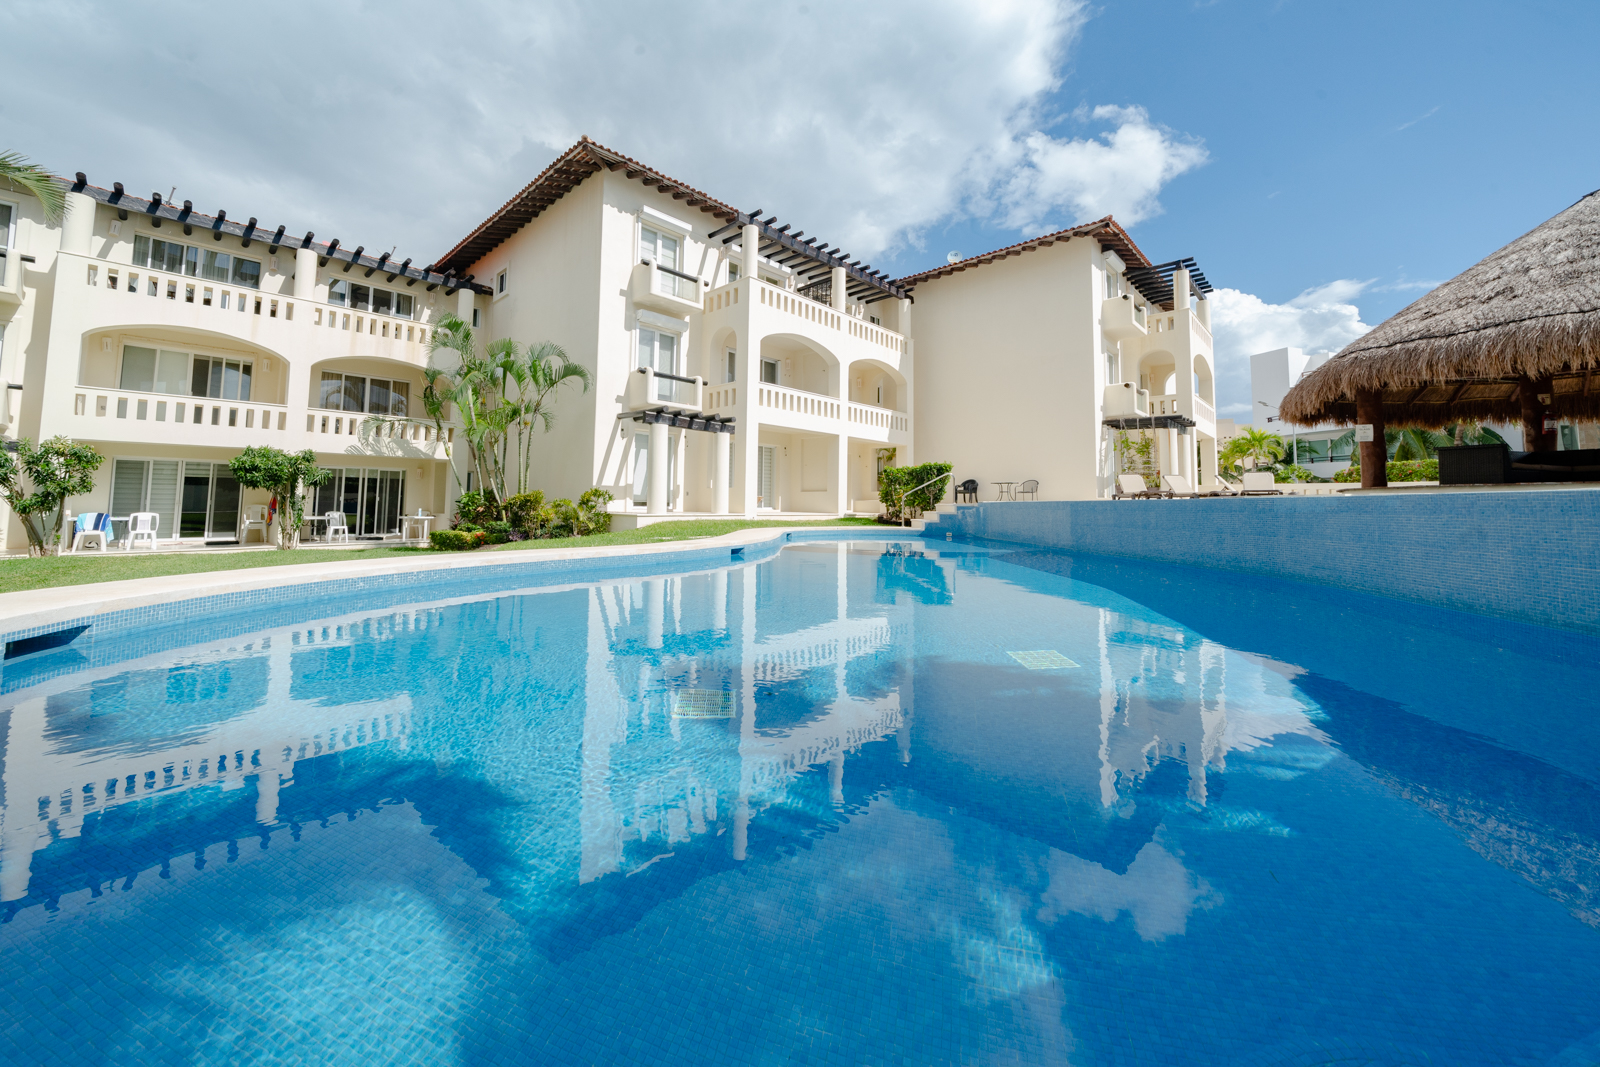 Luna Maya Tormenta 5 Playa del Carmen Condo Home For Sale Real Estate to Buy